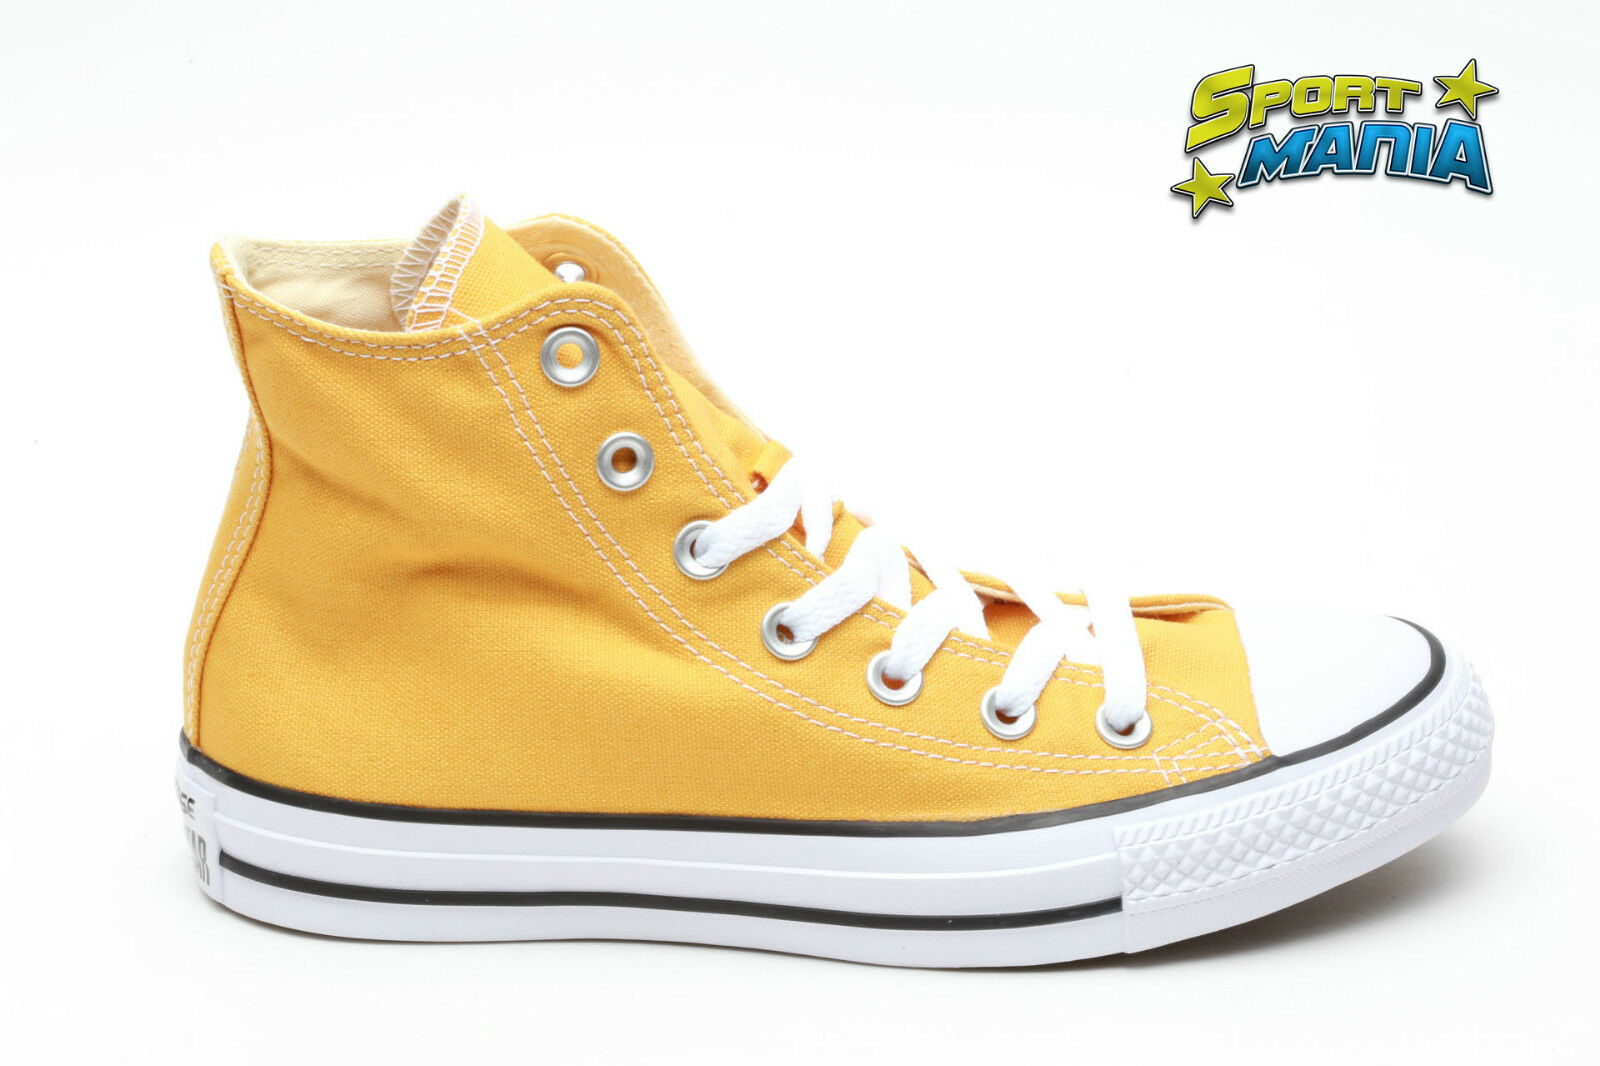 Converse Hi All Star Hi Converse Chuck Taylor Schuhe Bianco Giallo Verde Blu Sneakers 5a3f3d